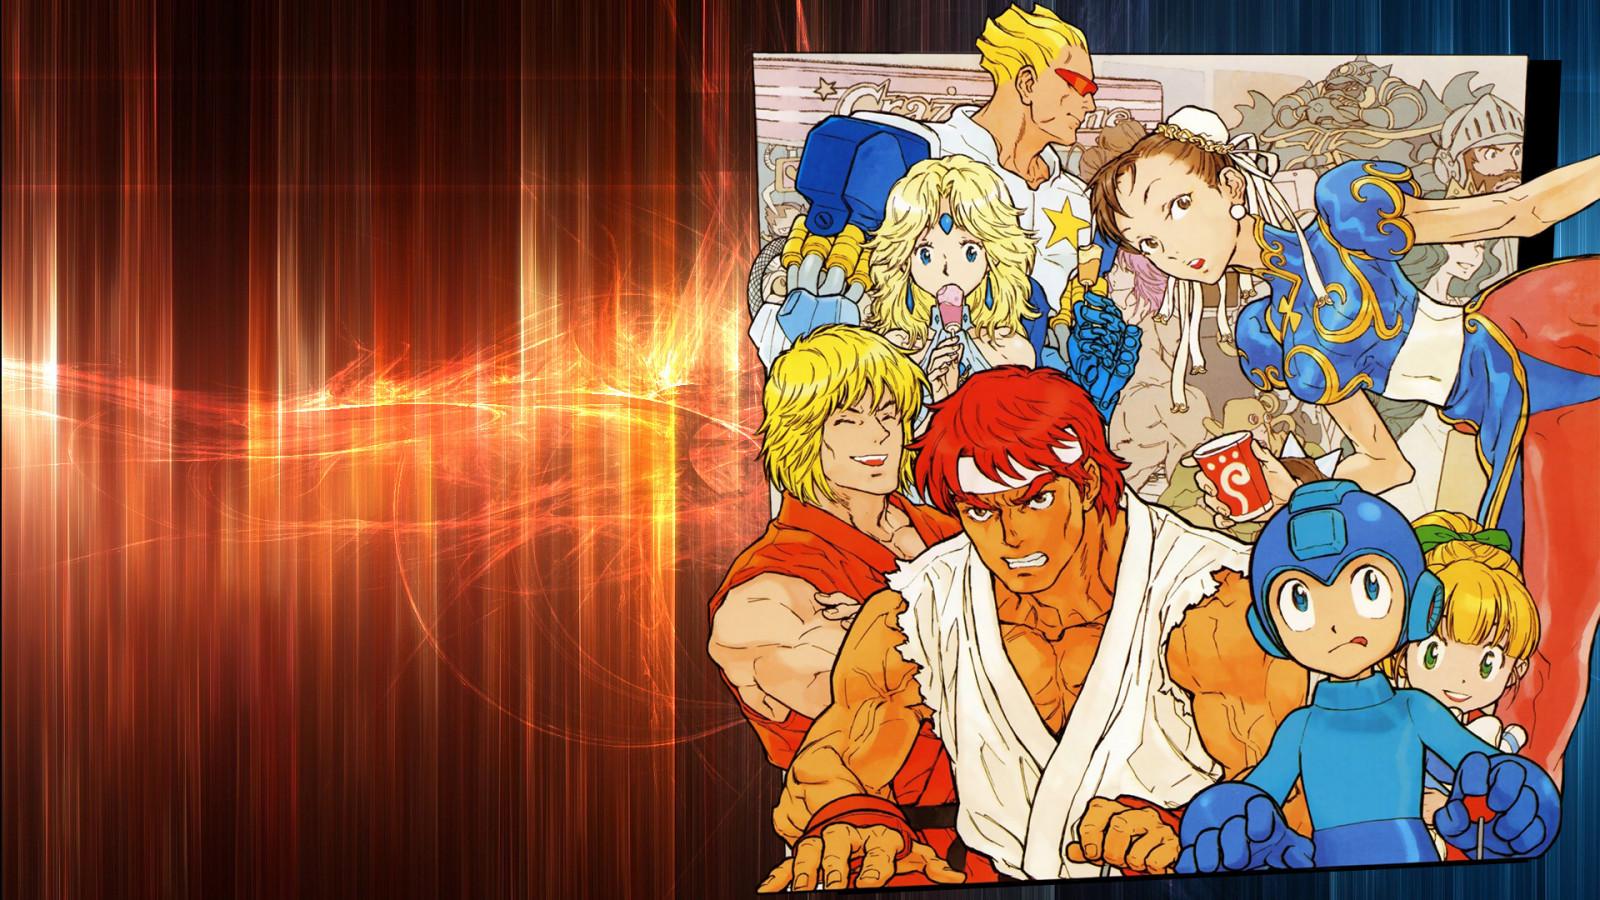 Wallpaper : Capcom, Chun Li, petarung jalanan, Fighting